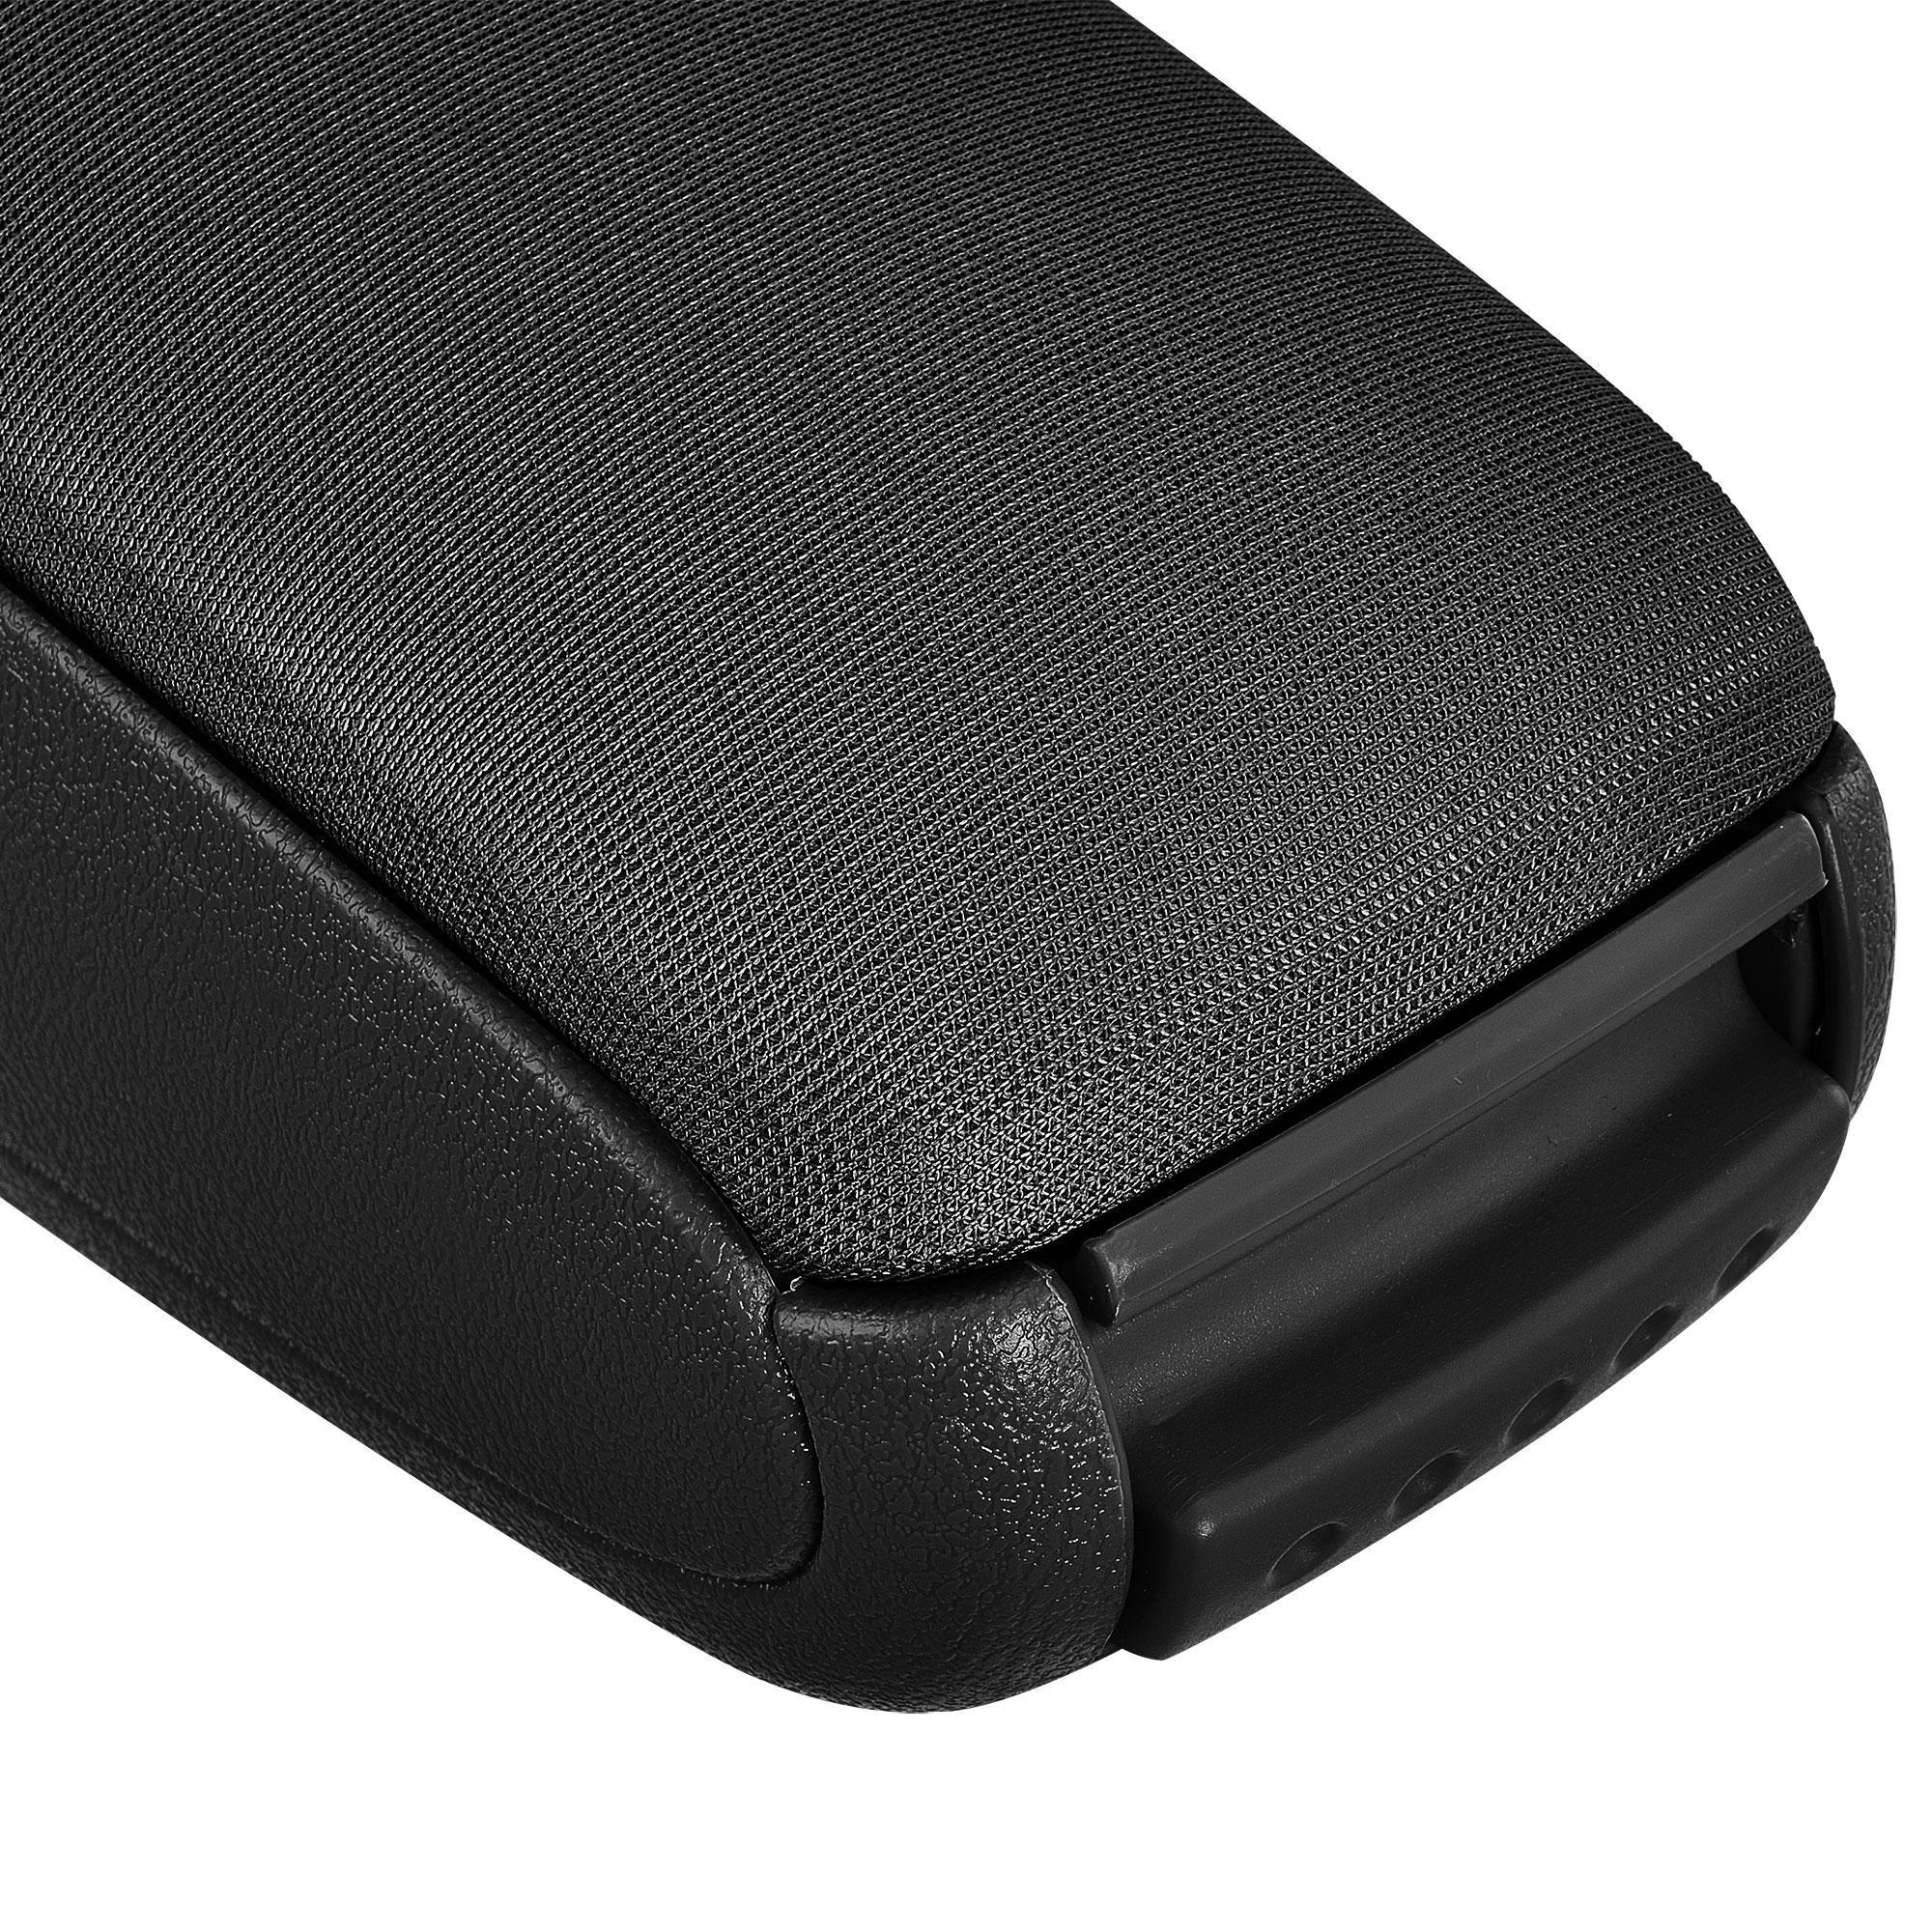 accoudoir central renault clio 3 iii estate 2005 2012 tissu noir neuf ebay. Black Bedroom Furniture Sets. Home Design Ideas